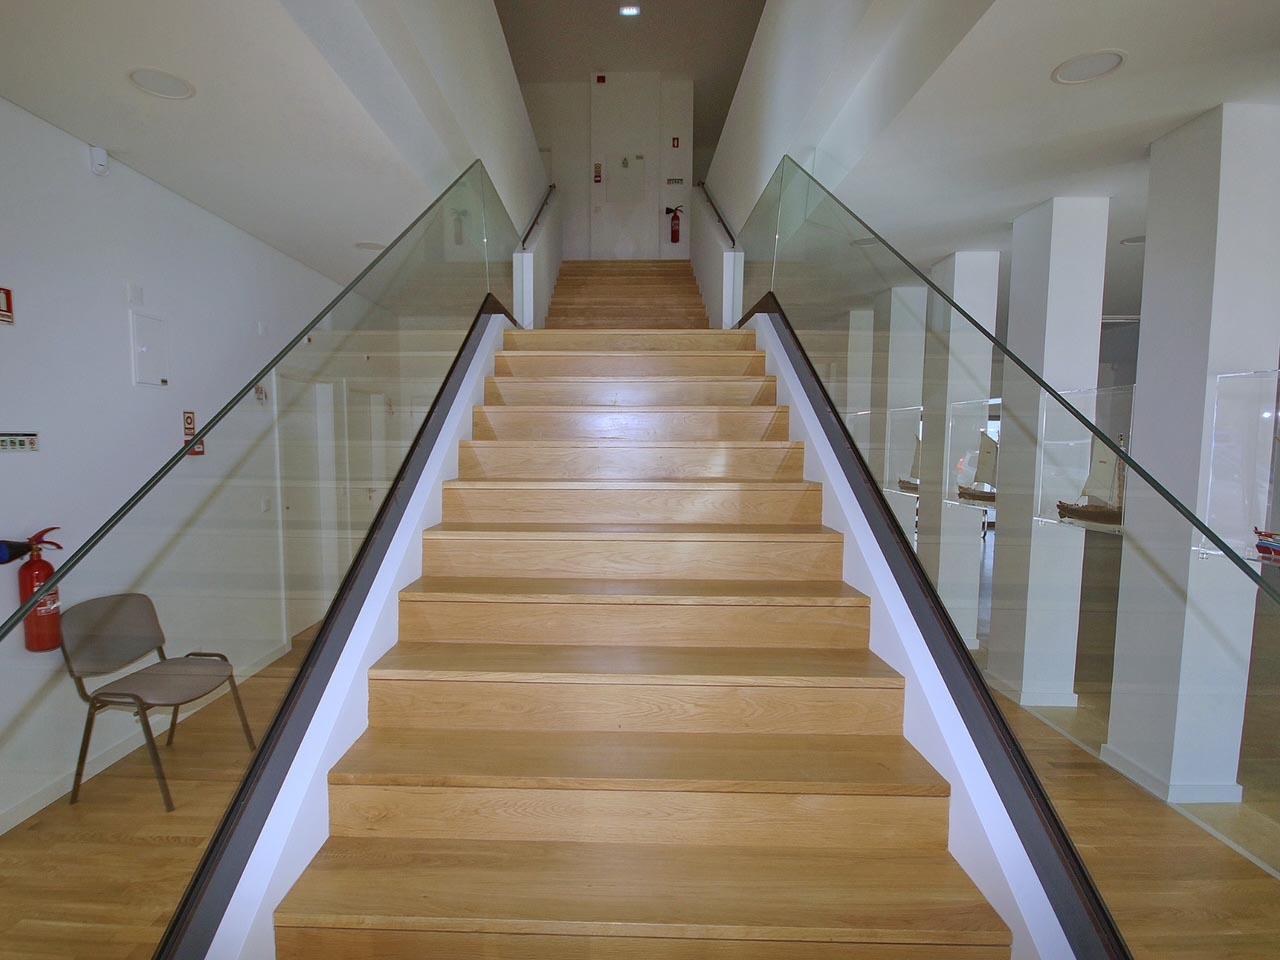 https://www.araujo-arquitectura.pt/wp-content/uploads/2021/01/10.jpg